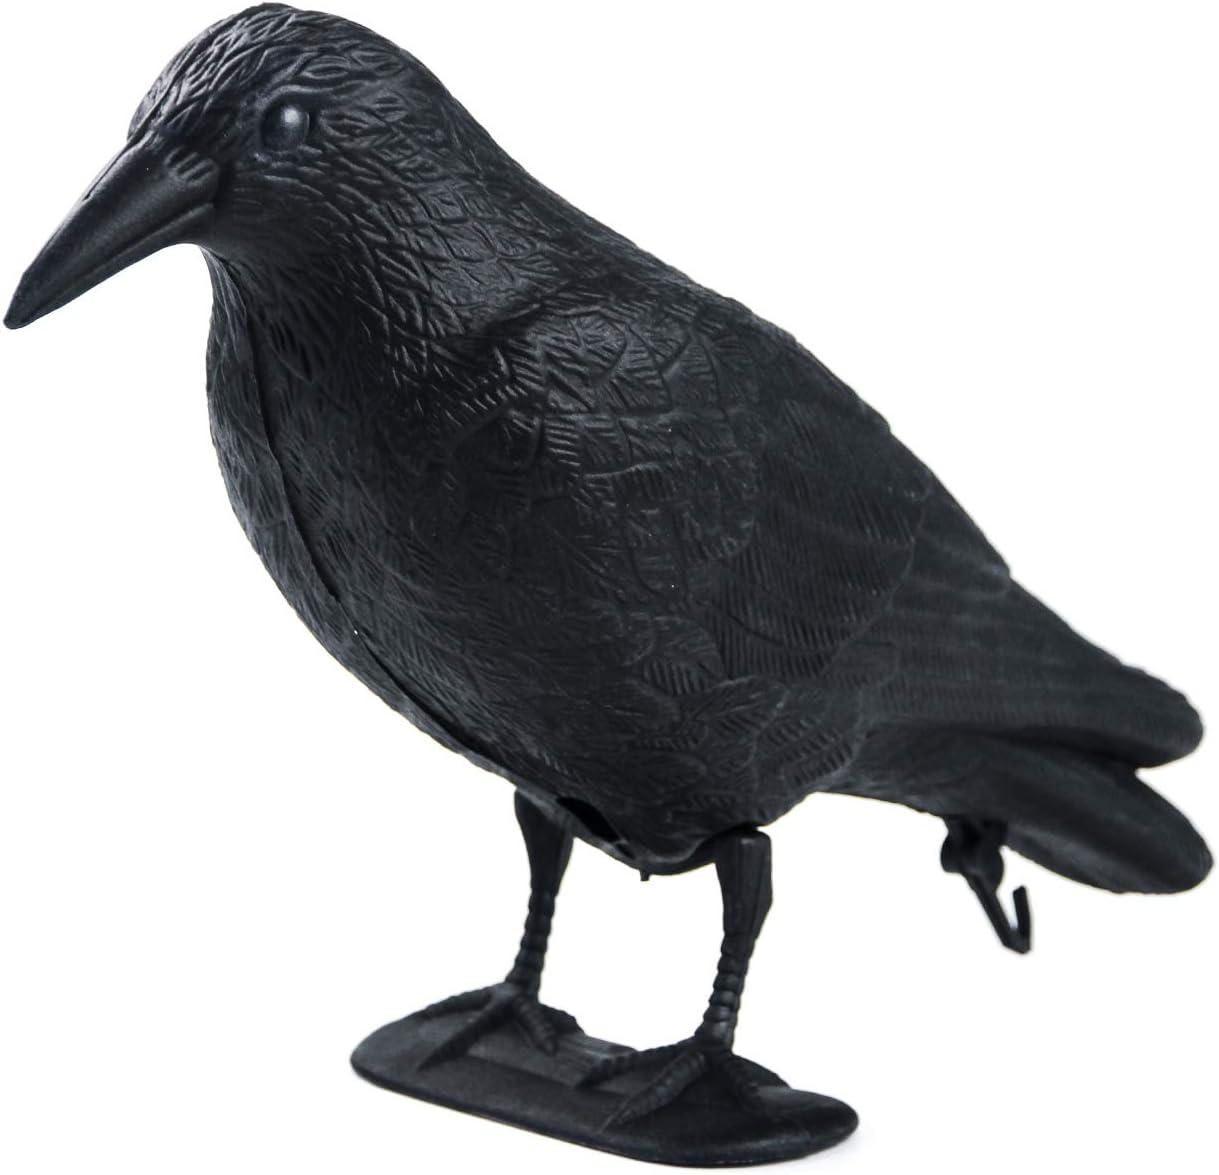 GUGULUZA Stand Full Body Flocking Crow Decoy Hunting Plastic Black Crow Decoys Hallows's Day Decor w/Feet Stake,Garden Decoration